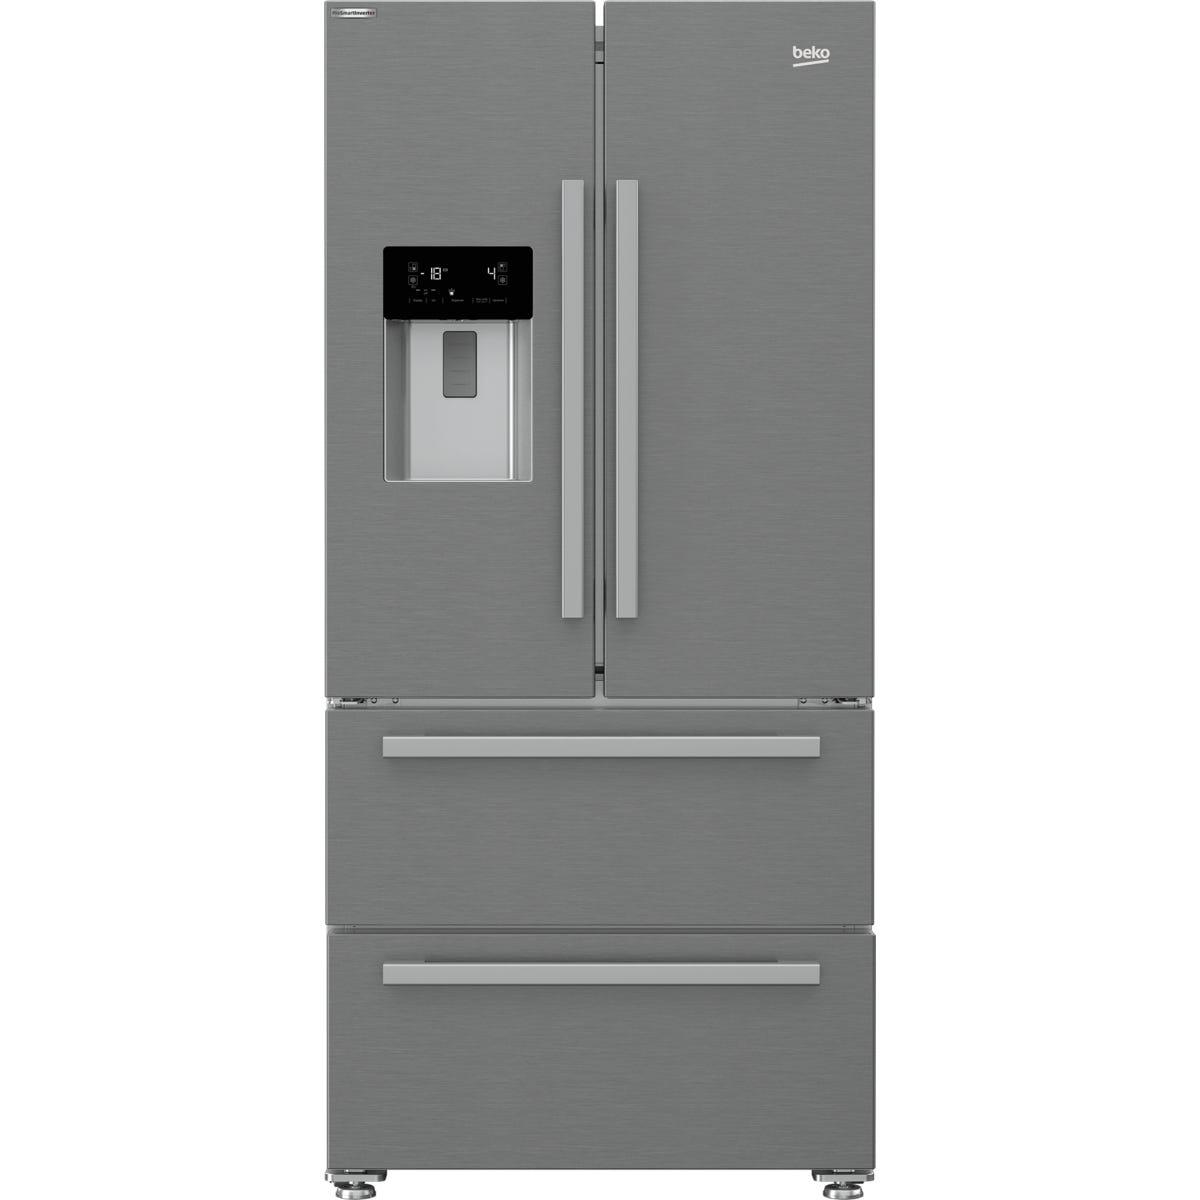 Beko GNE360520DX 530L American Style Fridge Freezer - Stainless Steel